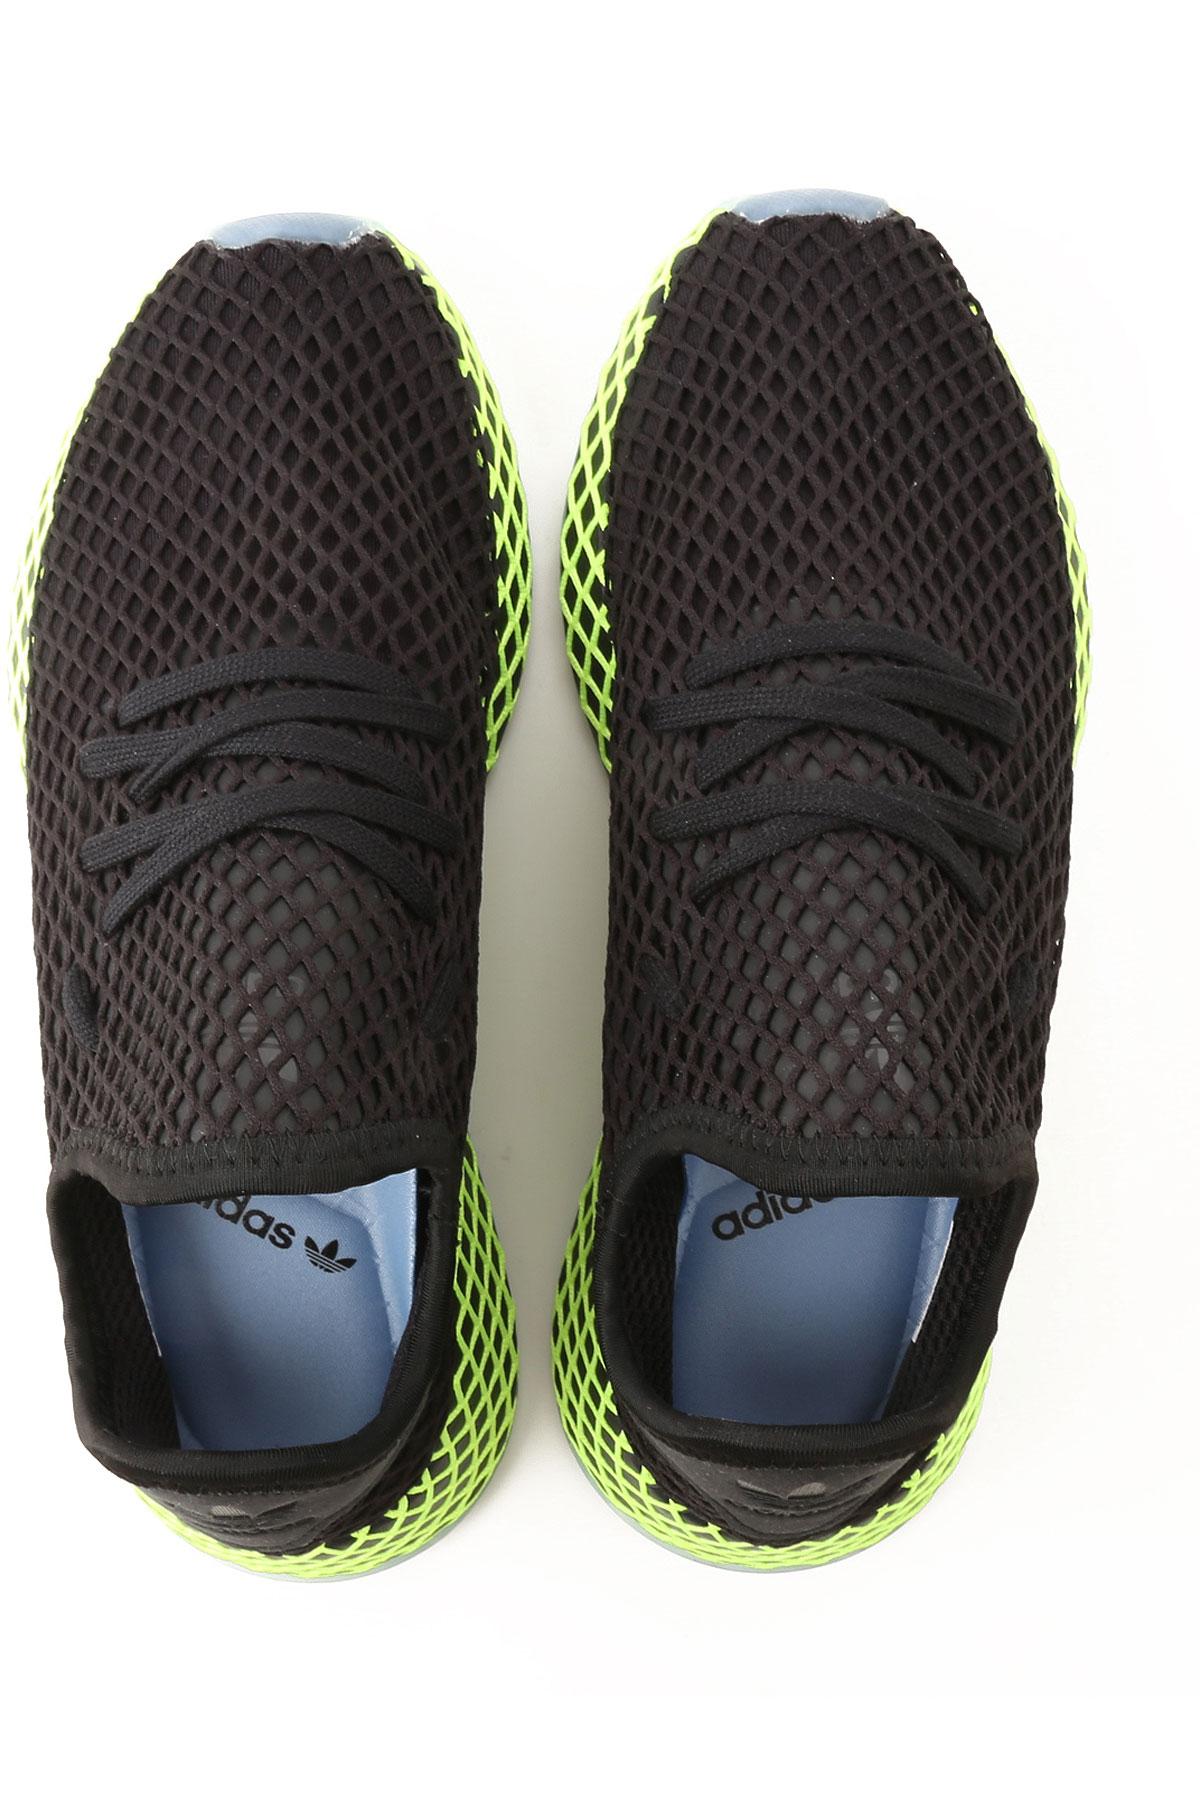 Otoño Zapatos Verde Adidas invierno 2018 Negro Para 19 Mujer qtxZxwdaR